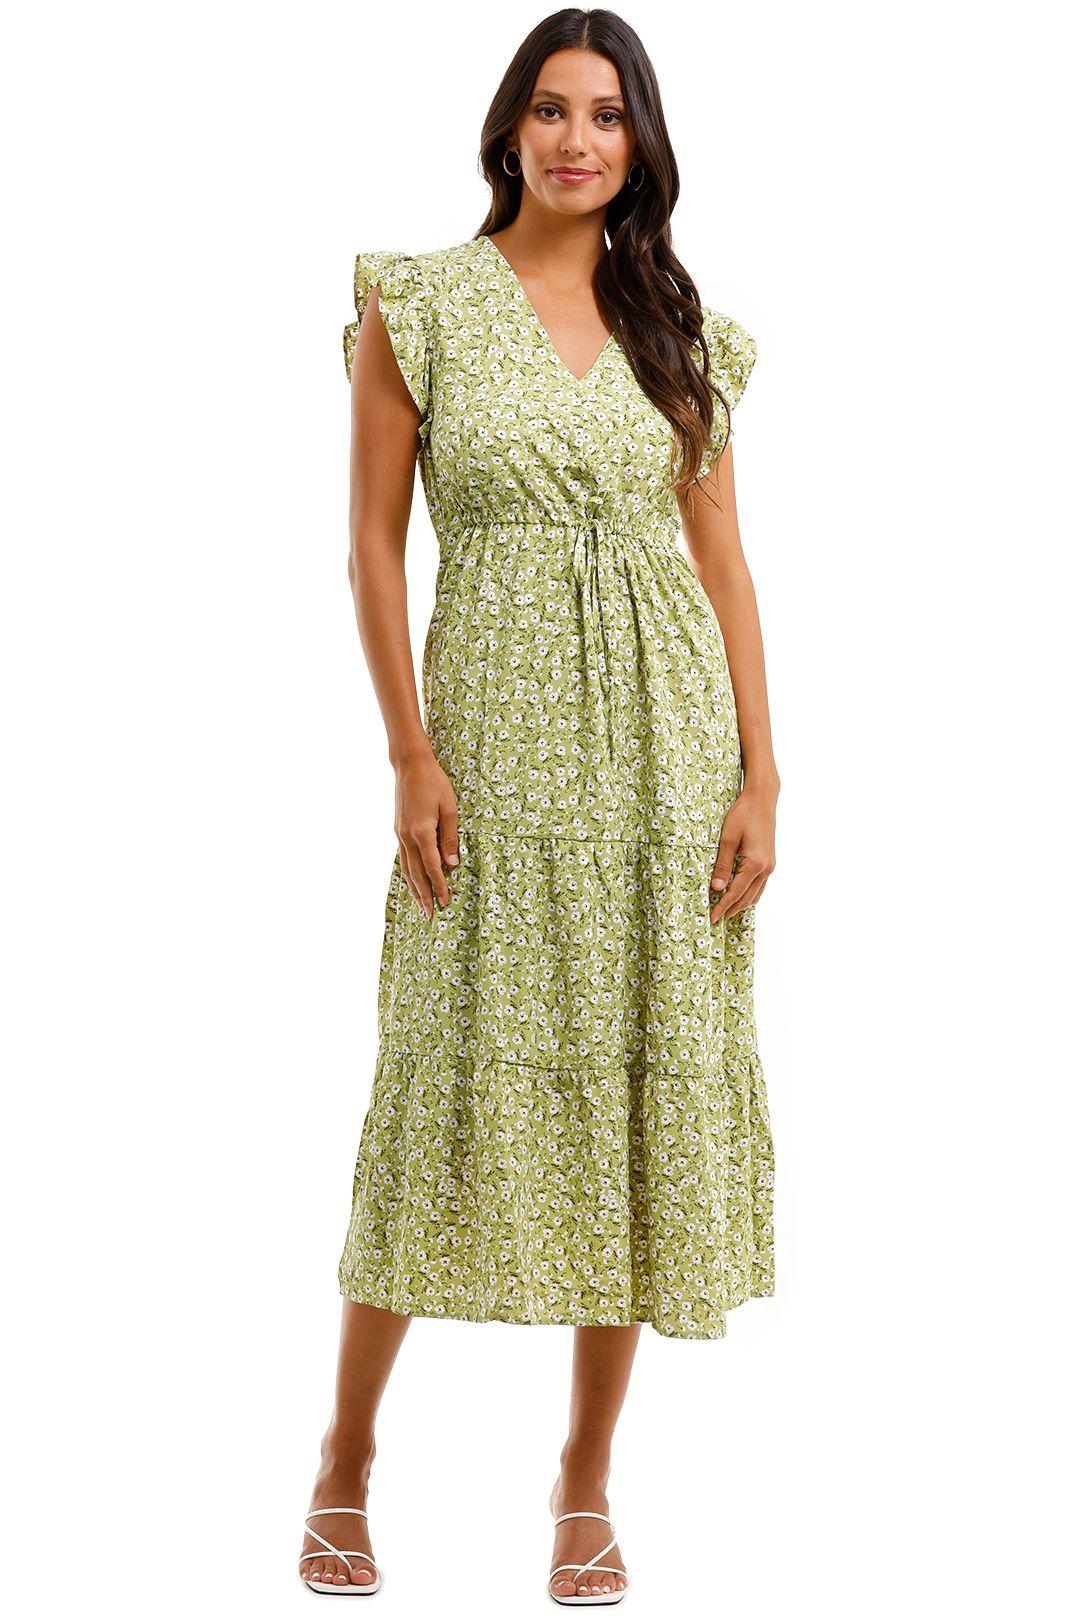 MNG Ruffled Sleeve Dress Green Maxi